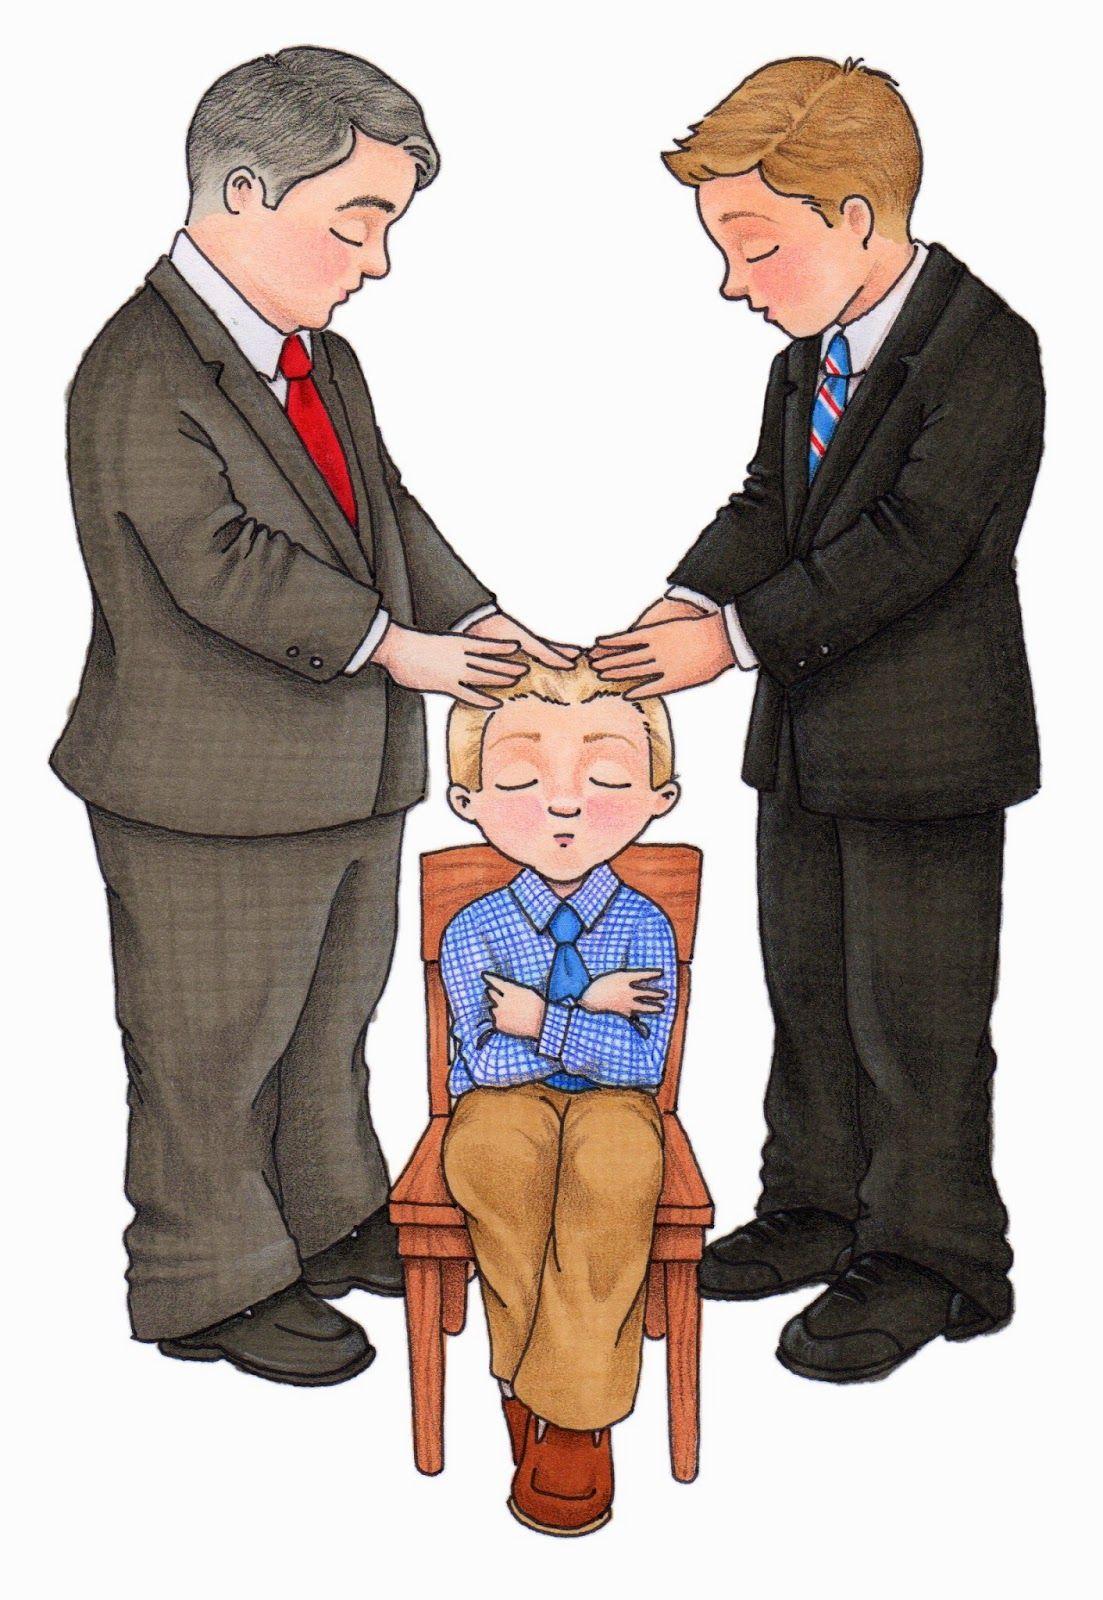 Lds clipart blessing. Priesthood wonderful clip art